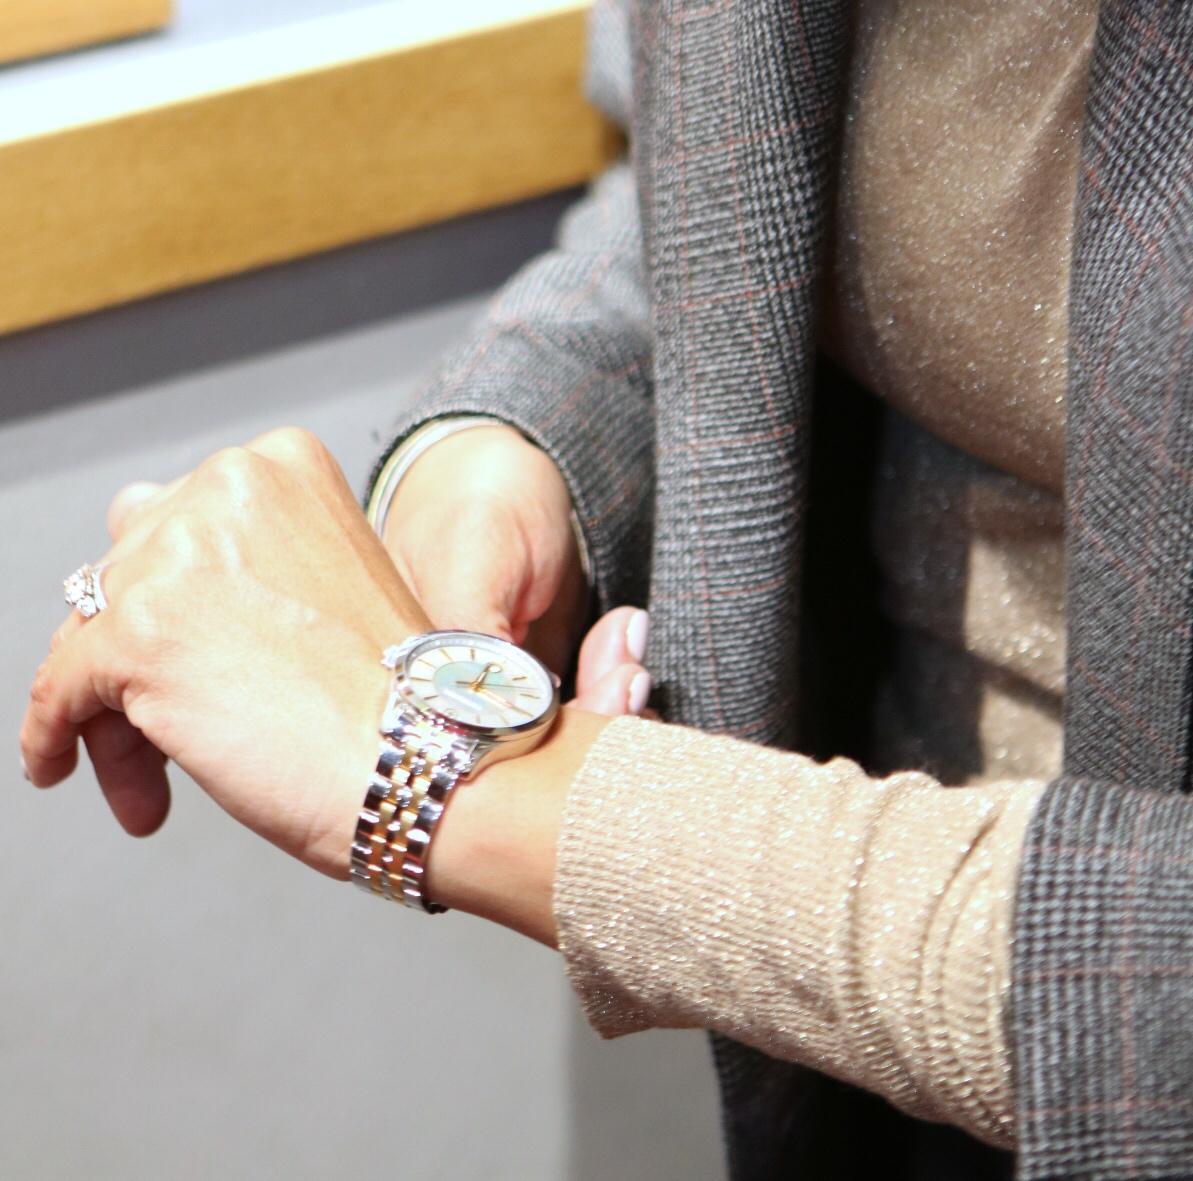 Victorinox - Women's Watch at Rockefeller Center